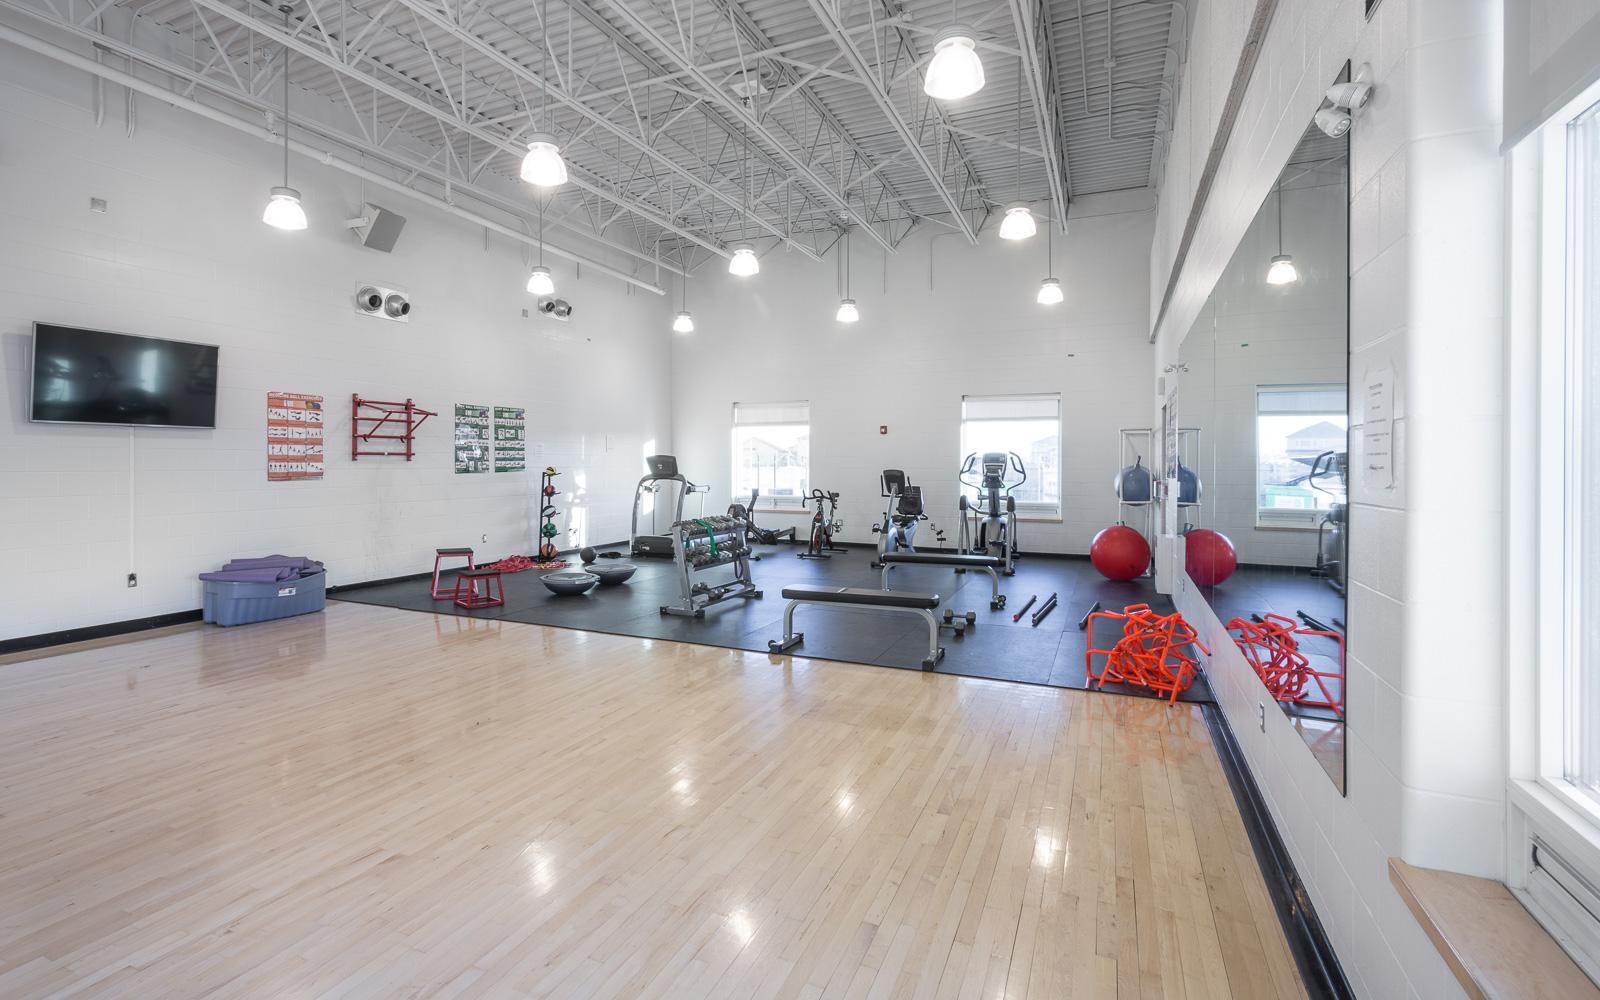 Amber Trails Community School, interior photo of gym workout room / Photo:  Lindsay Reid